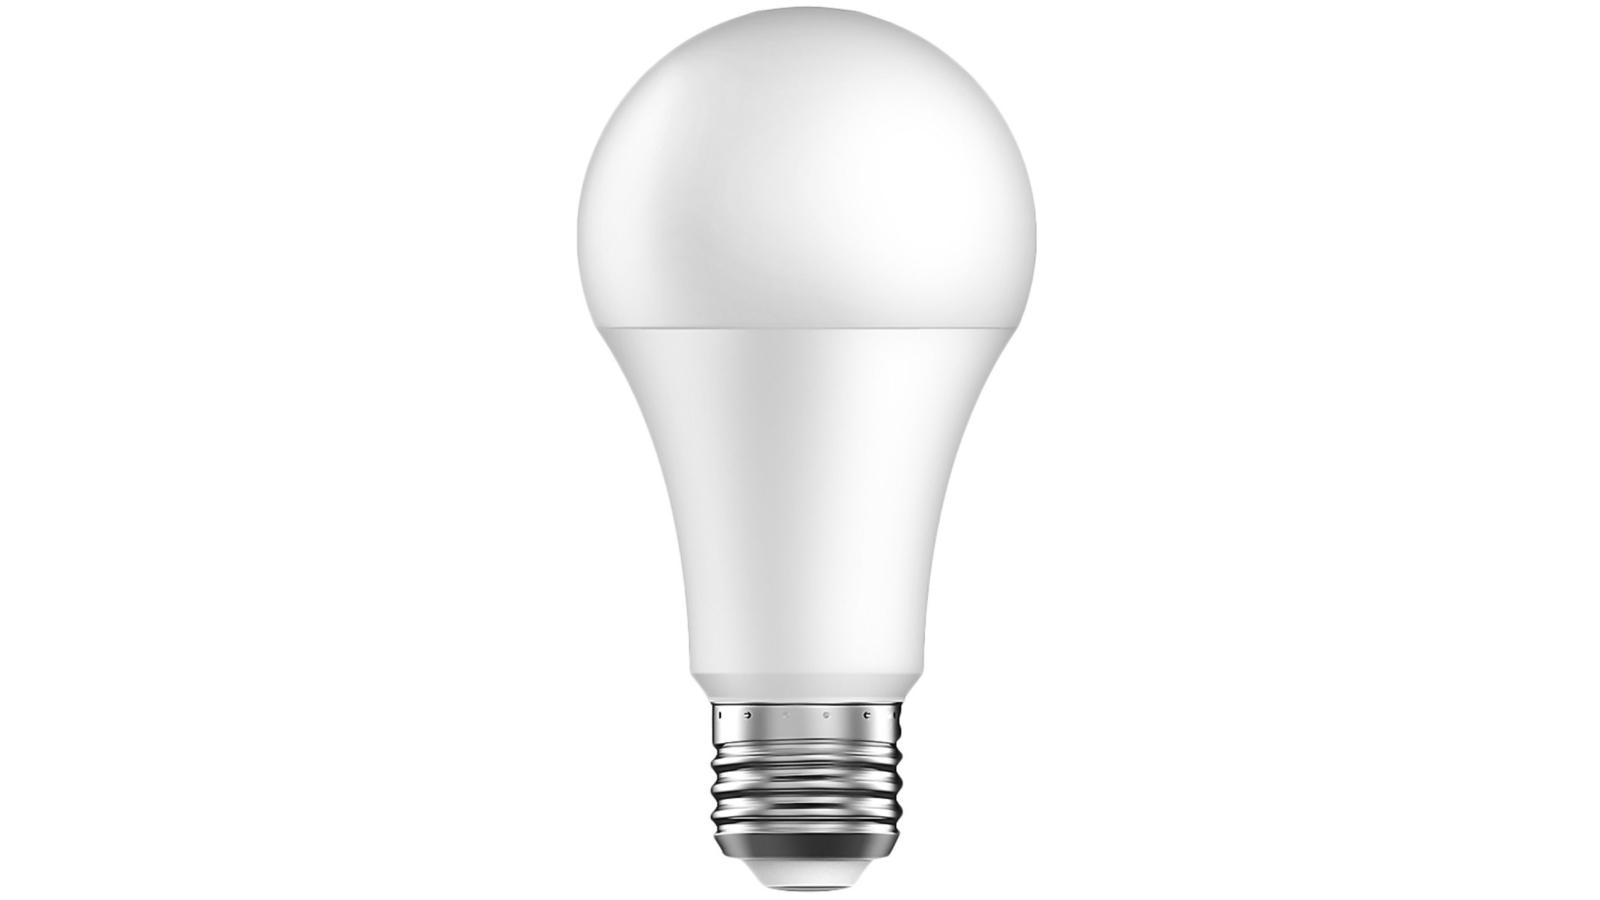 Buy Connect Smart 10w E27 White Led Light Bulb Harvey Norman Au